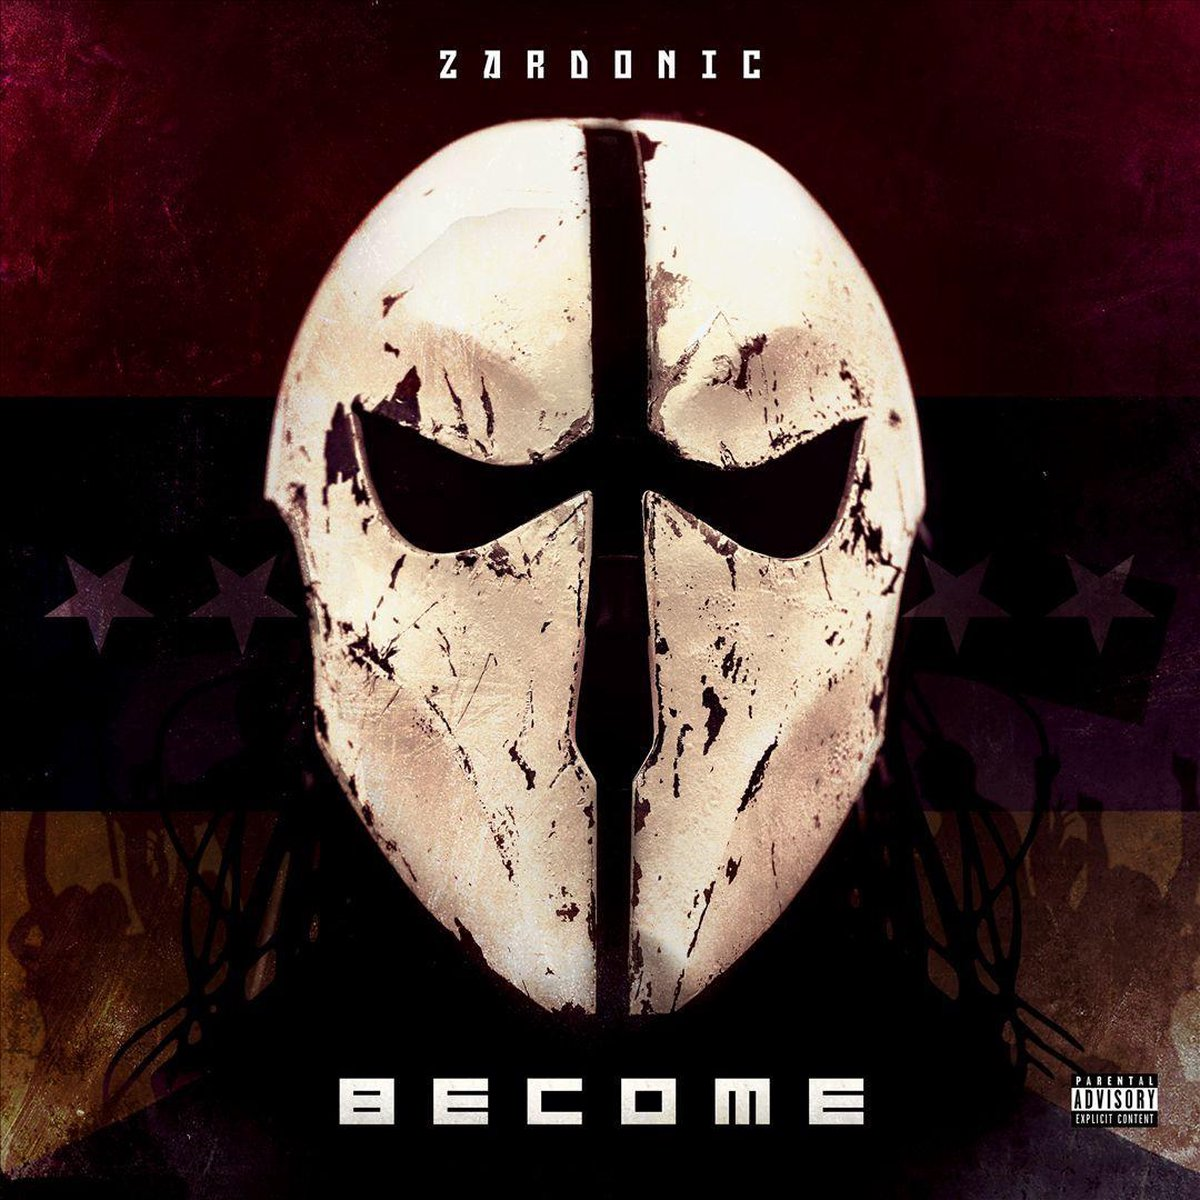 Become - Zardonic